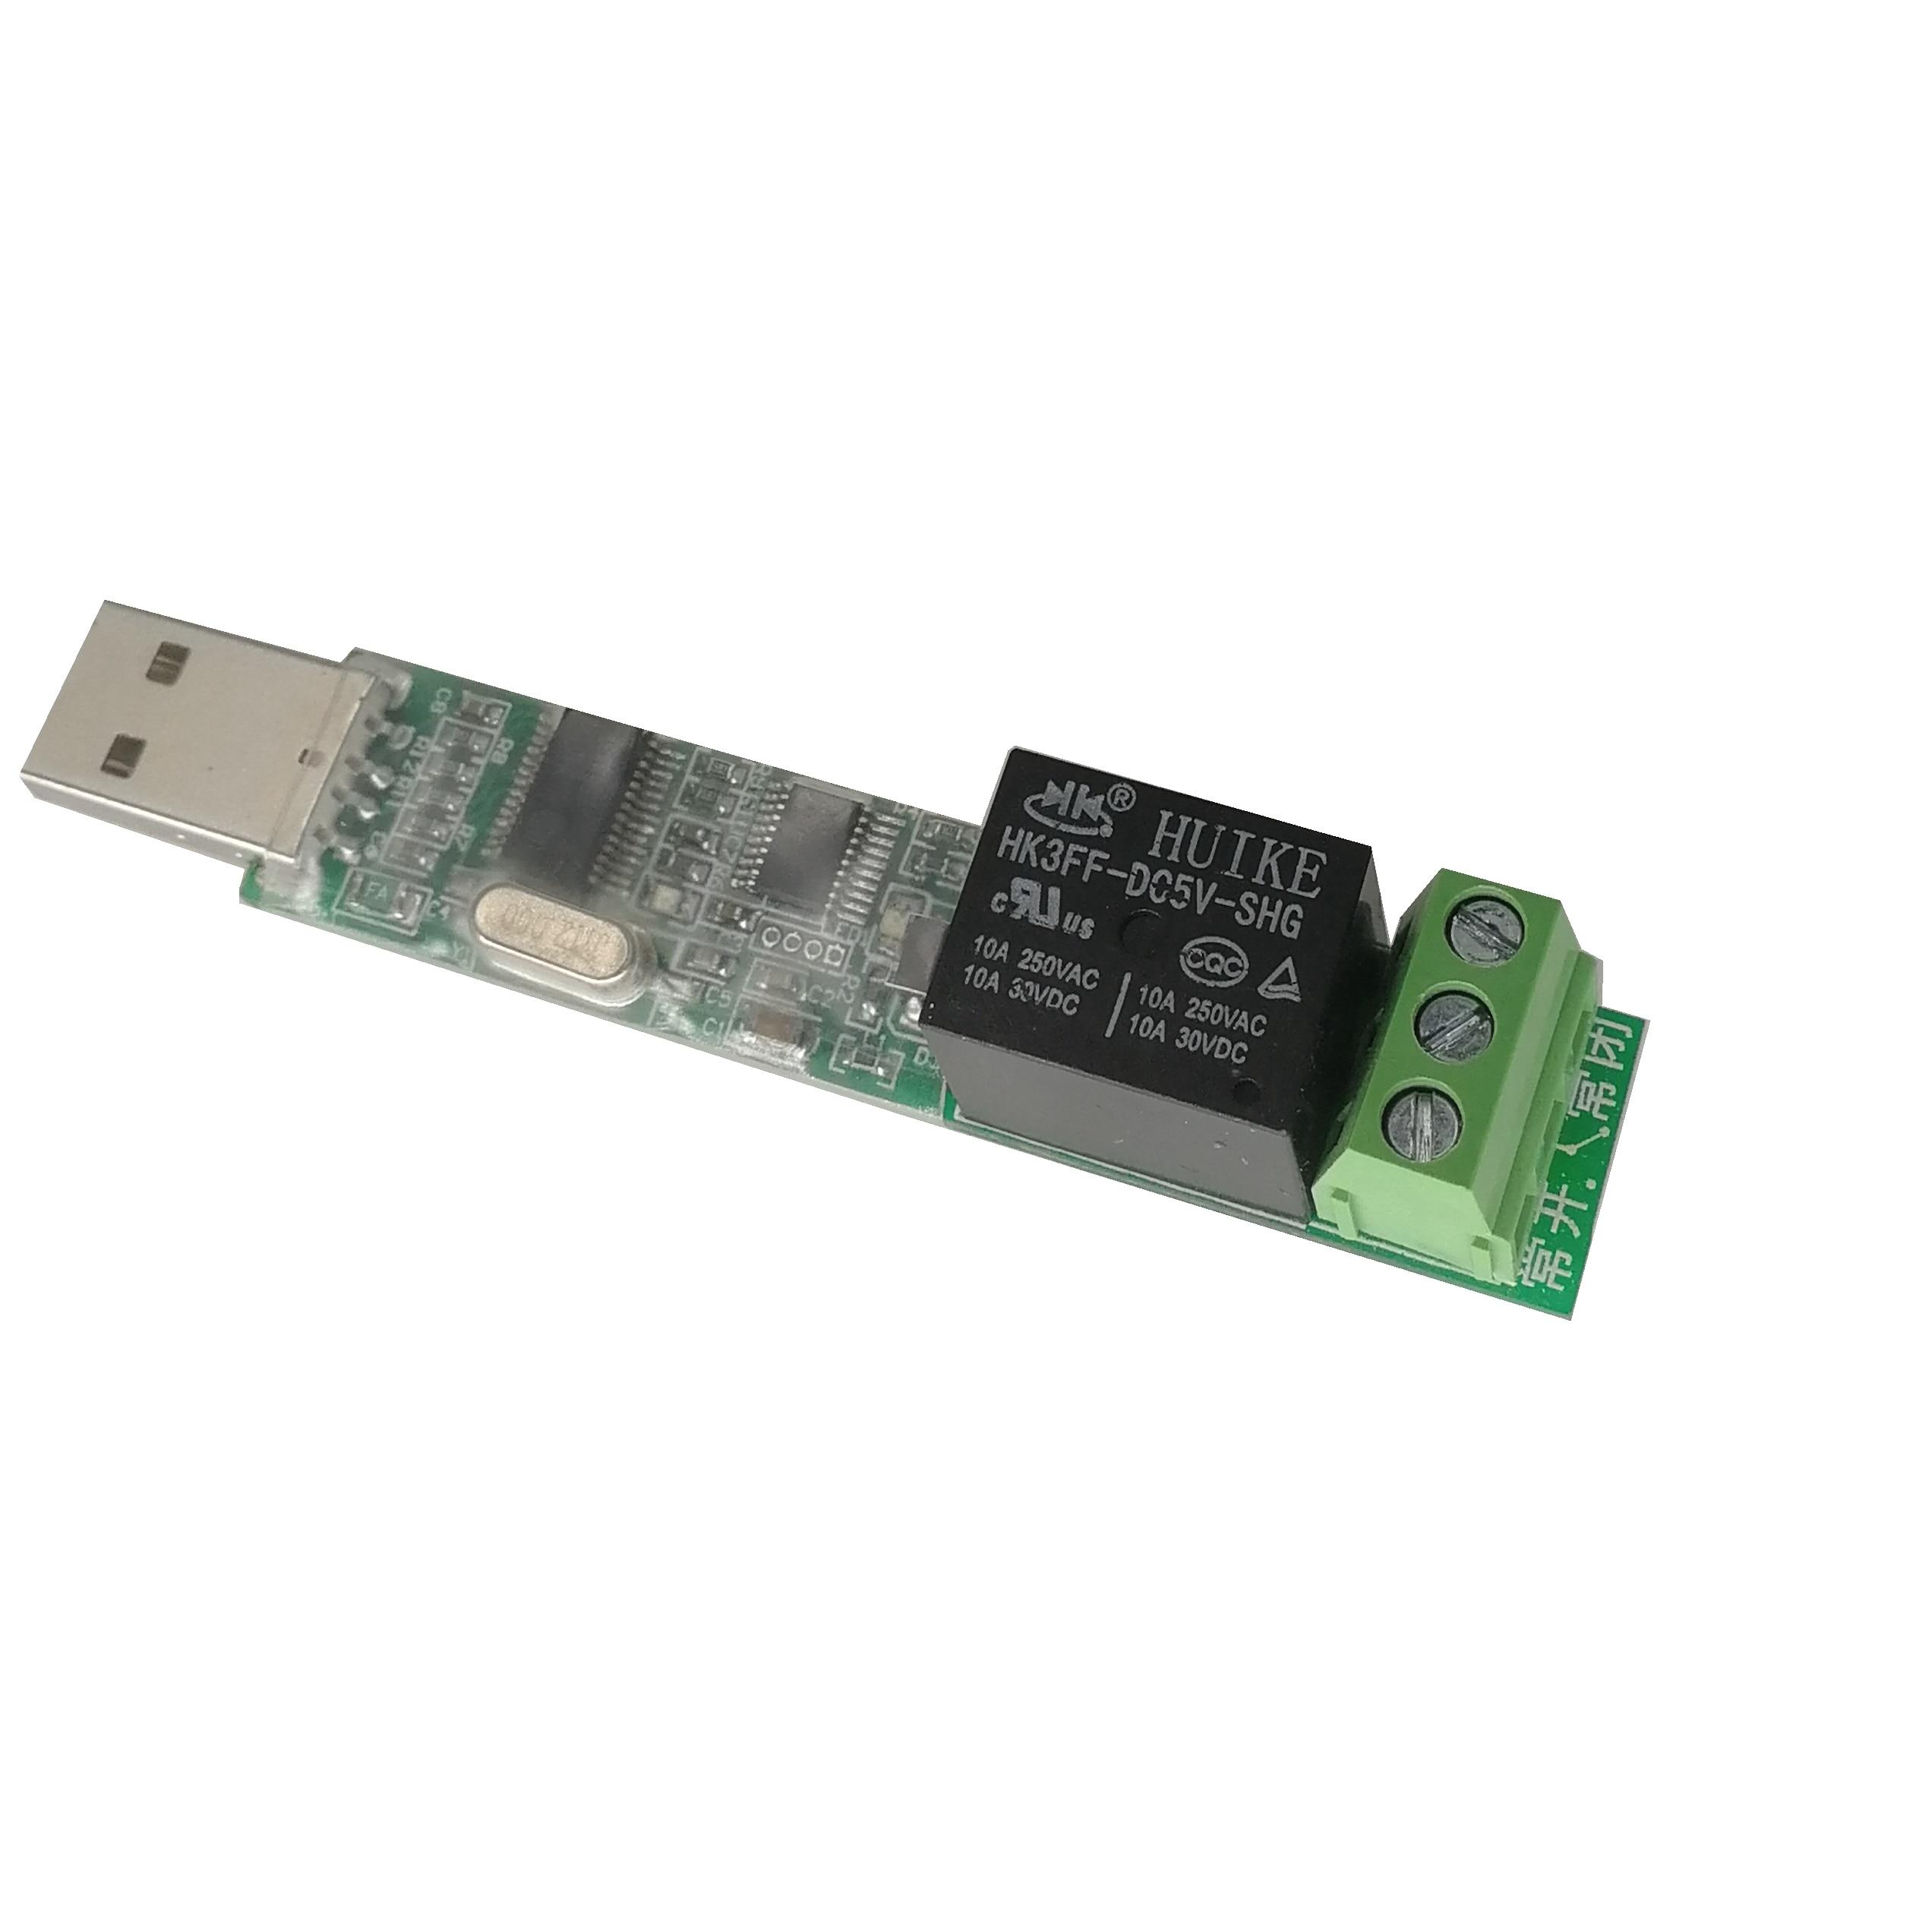 USB Relay Module PL2303 PC Control Switch Module NC/NO Support Modbus ASCII/RTU 12v no nc relay module water leakage control module for water leak sensor